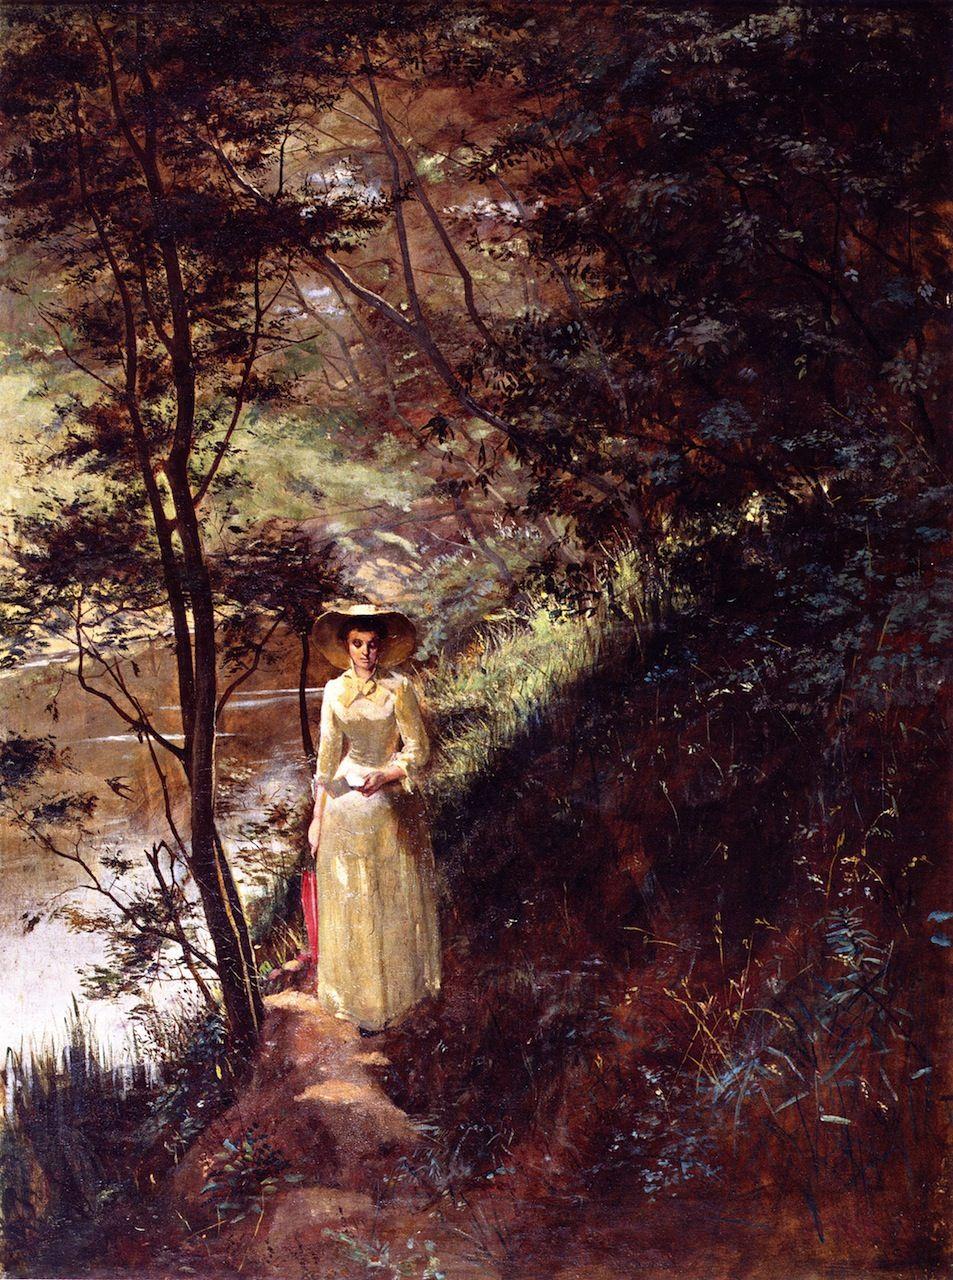 The Letter Frederick Mccubbin 1884 25 February 1855 20 December 1917 Was An Australian Pa Famous Landscape Paintings Australian Painting Famous Art